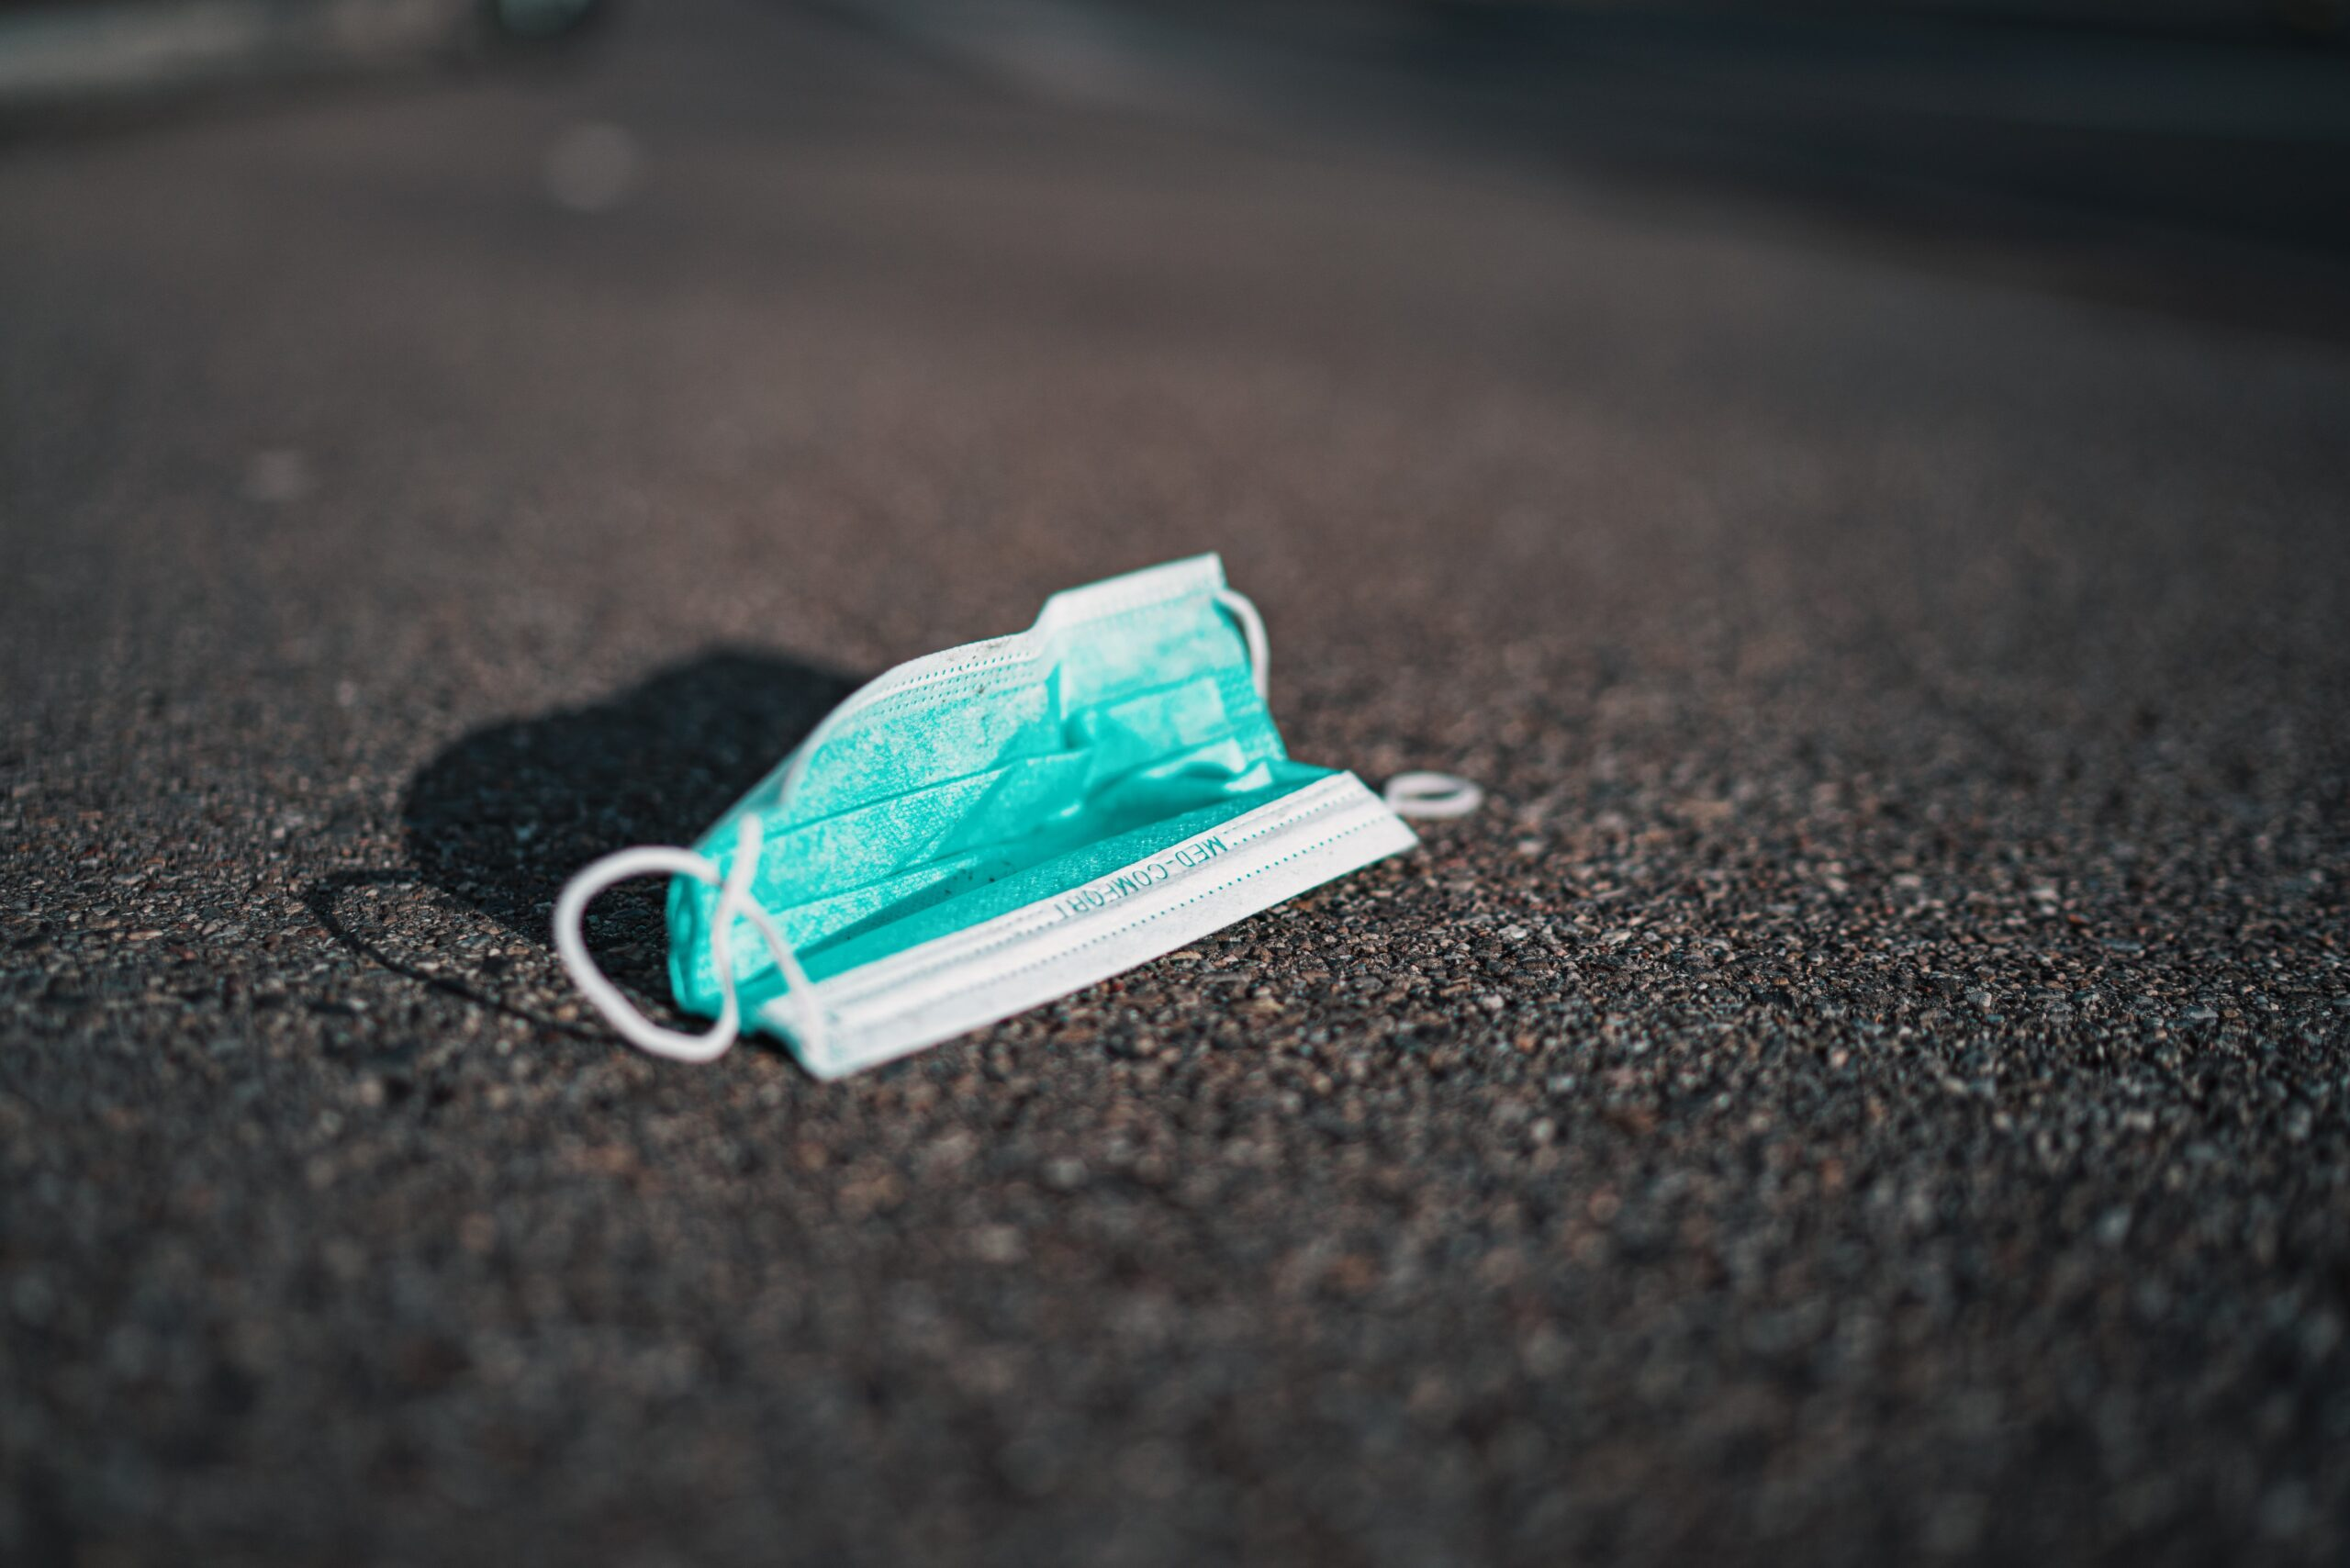 Plastics in the Time of Coronavirus